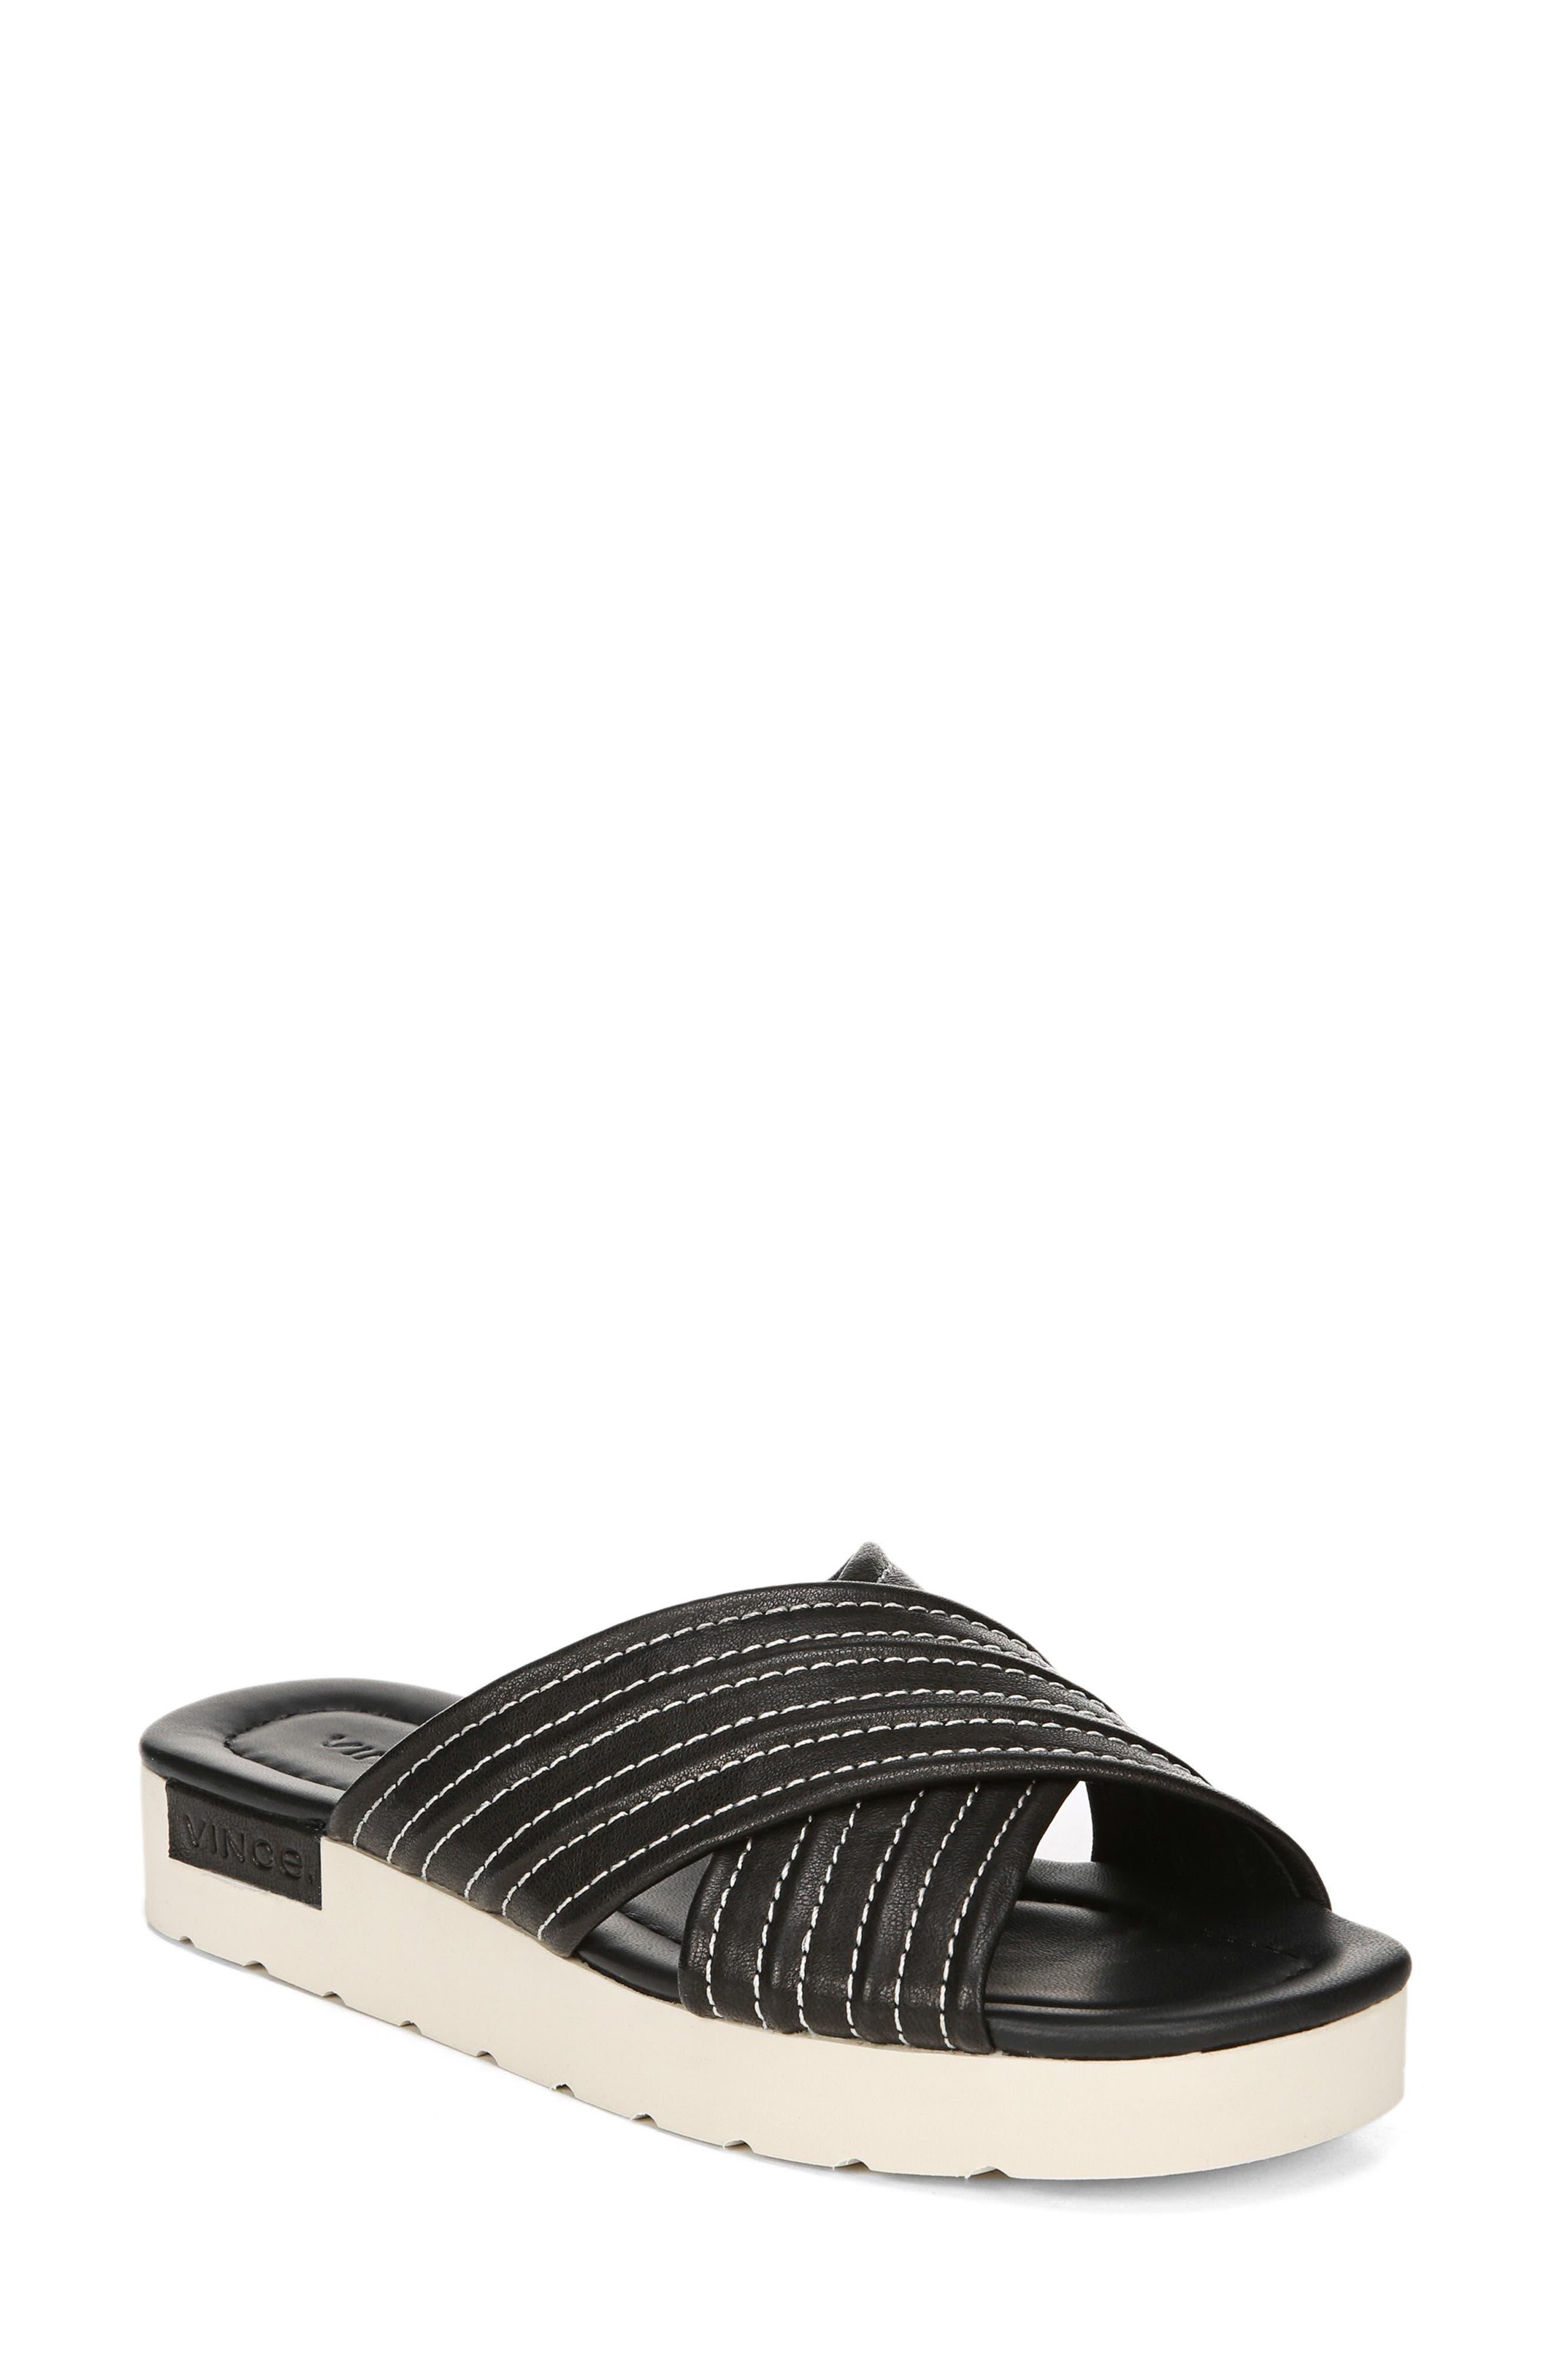 Camden Slide Sandal, Main, color, BLACK